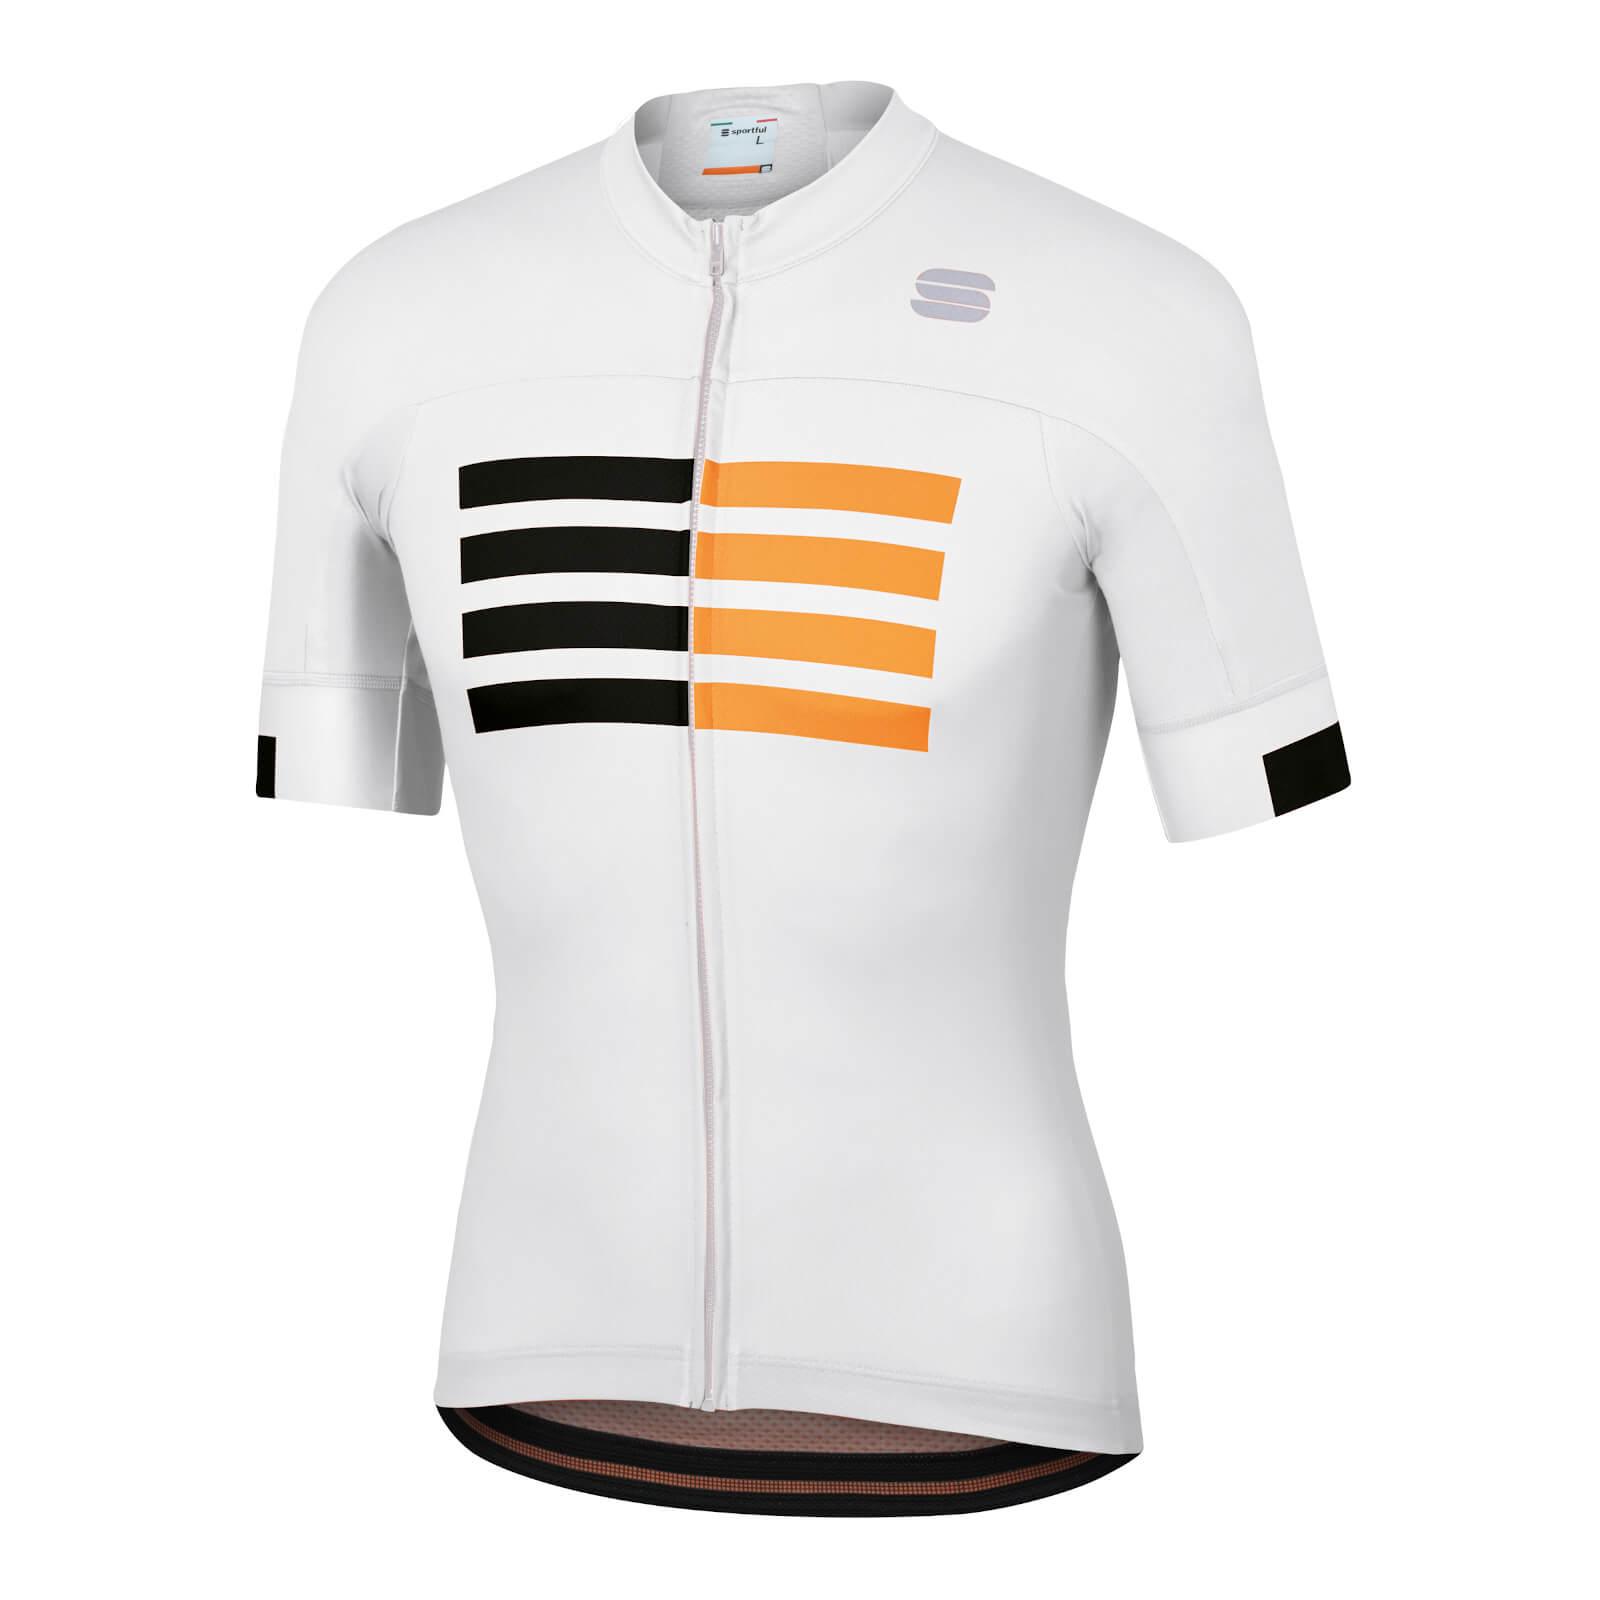 Sportful Wire Jersey - M - White/Black/Gold